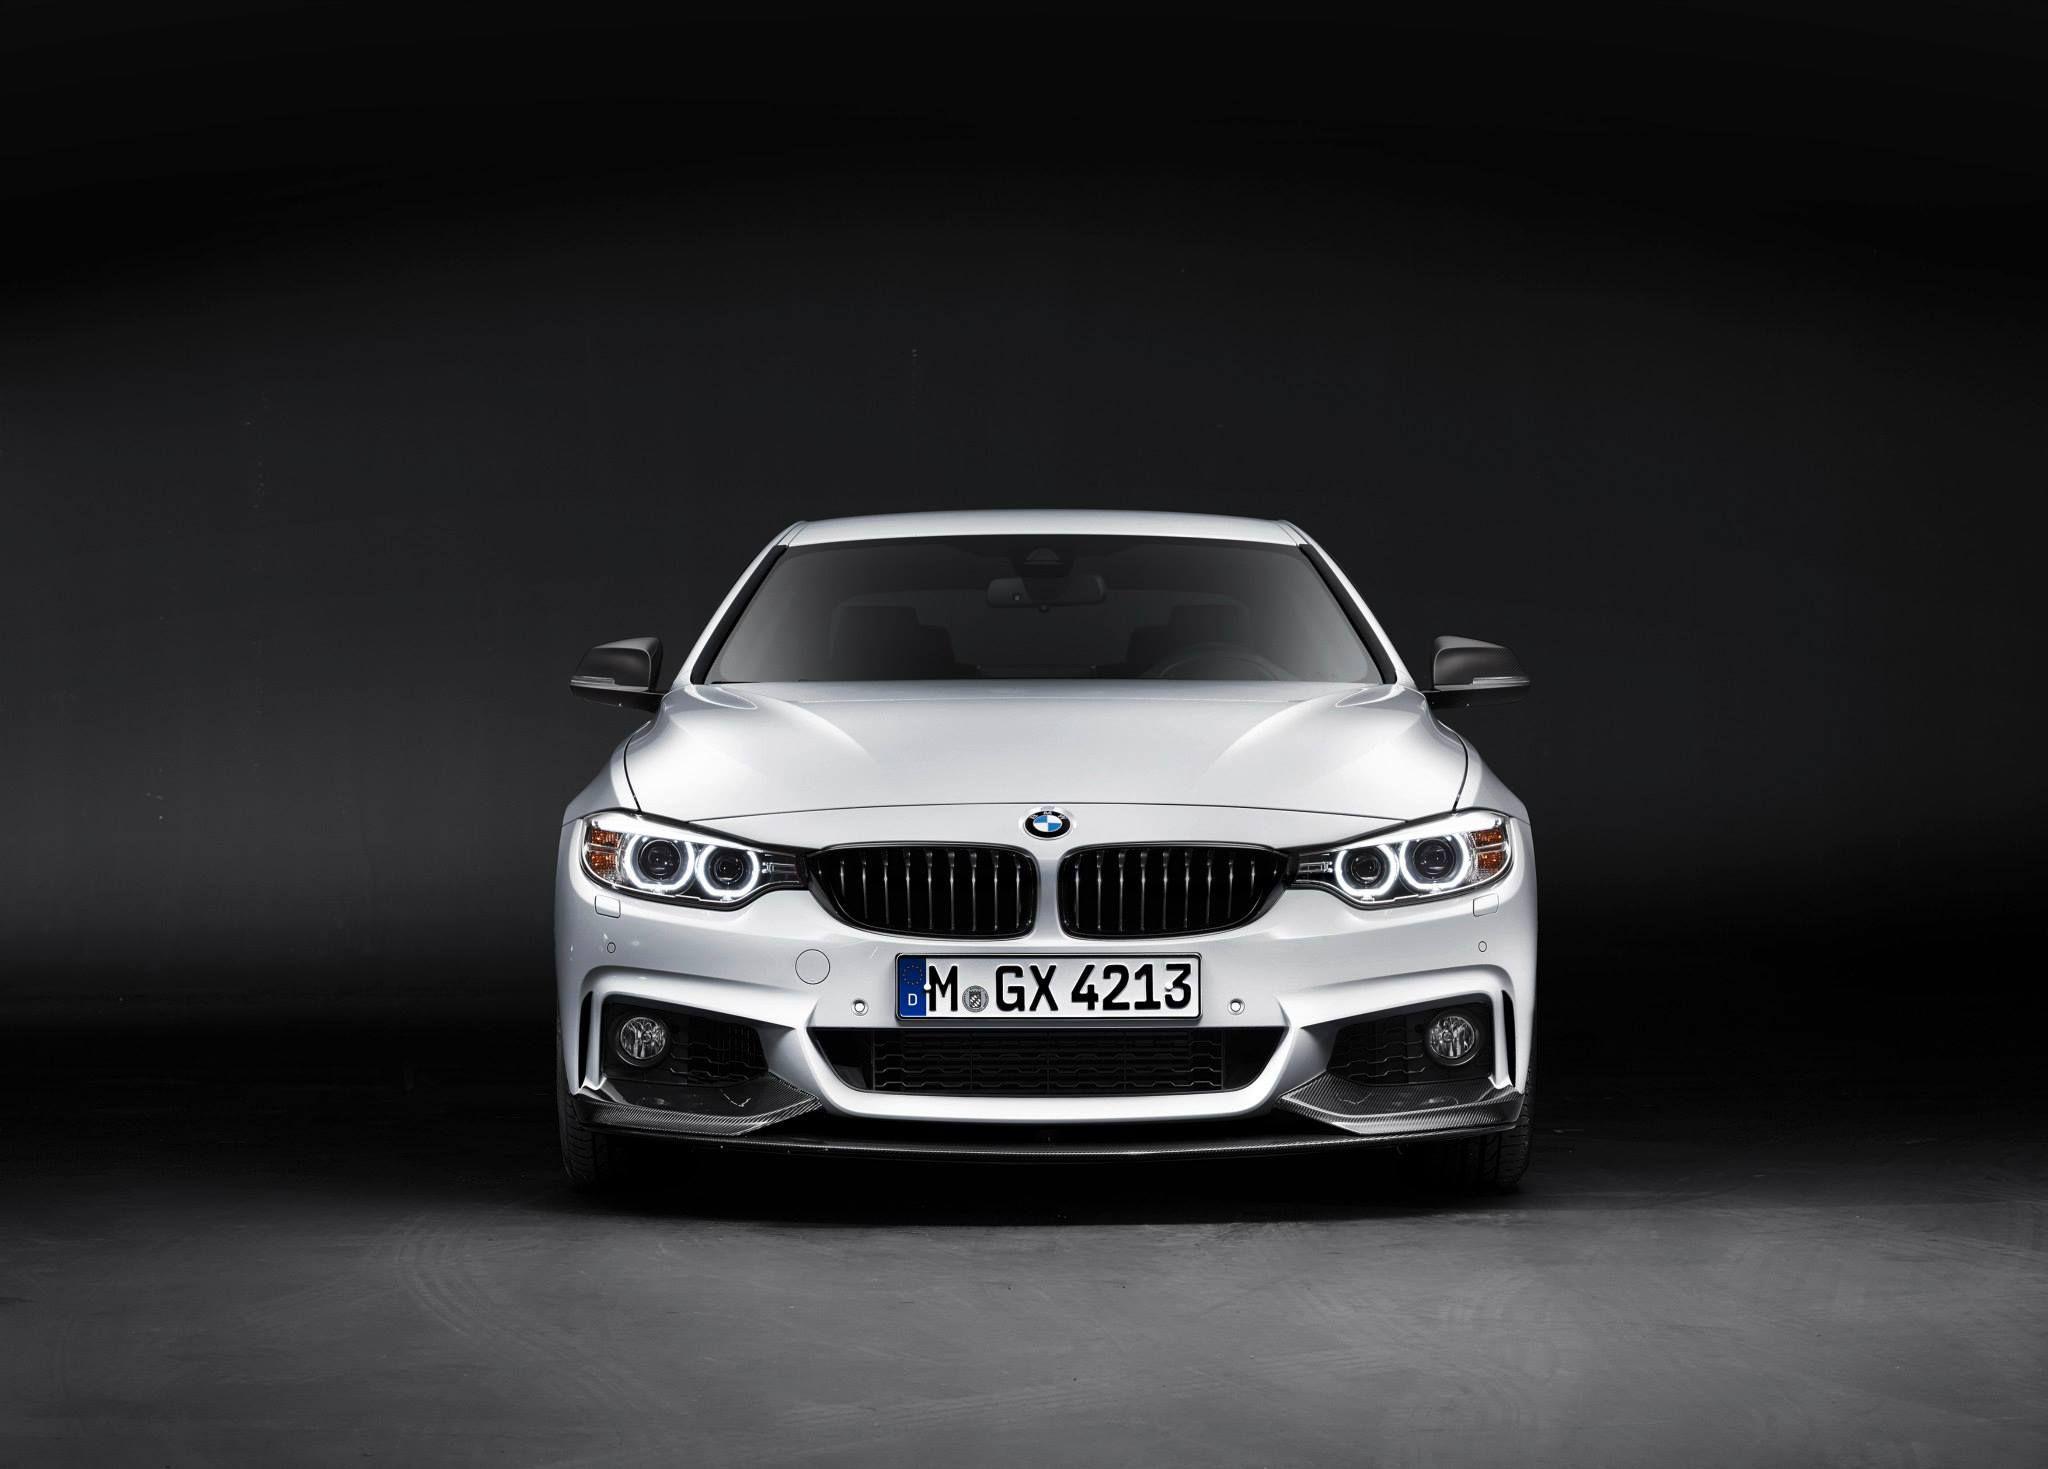 Bmw S M Performance Parts 4 Series Heads To Frankfurt Bmw 4 Series Bmw 4 Bmw 4 Series Coupe